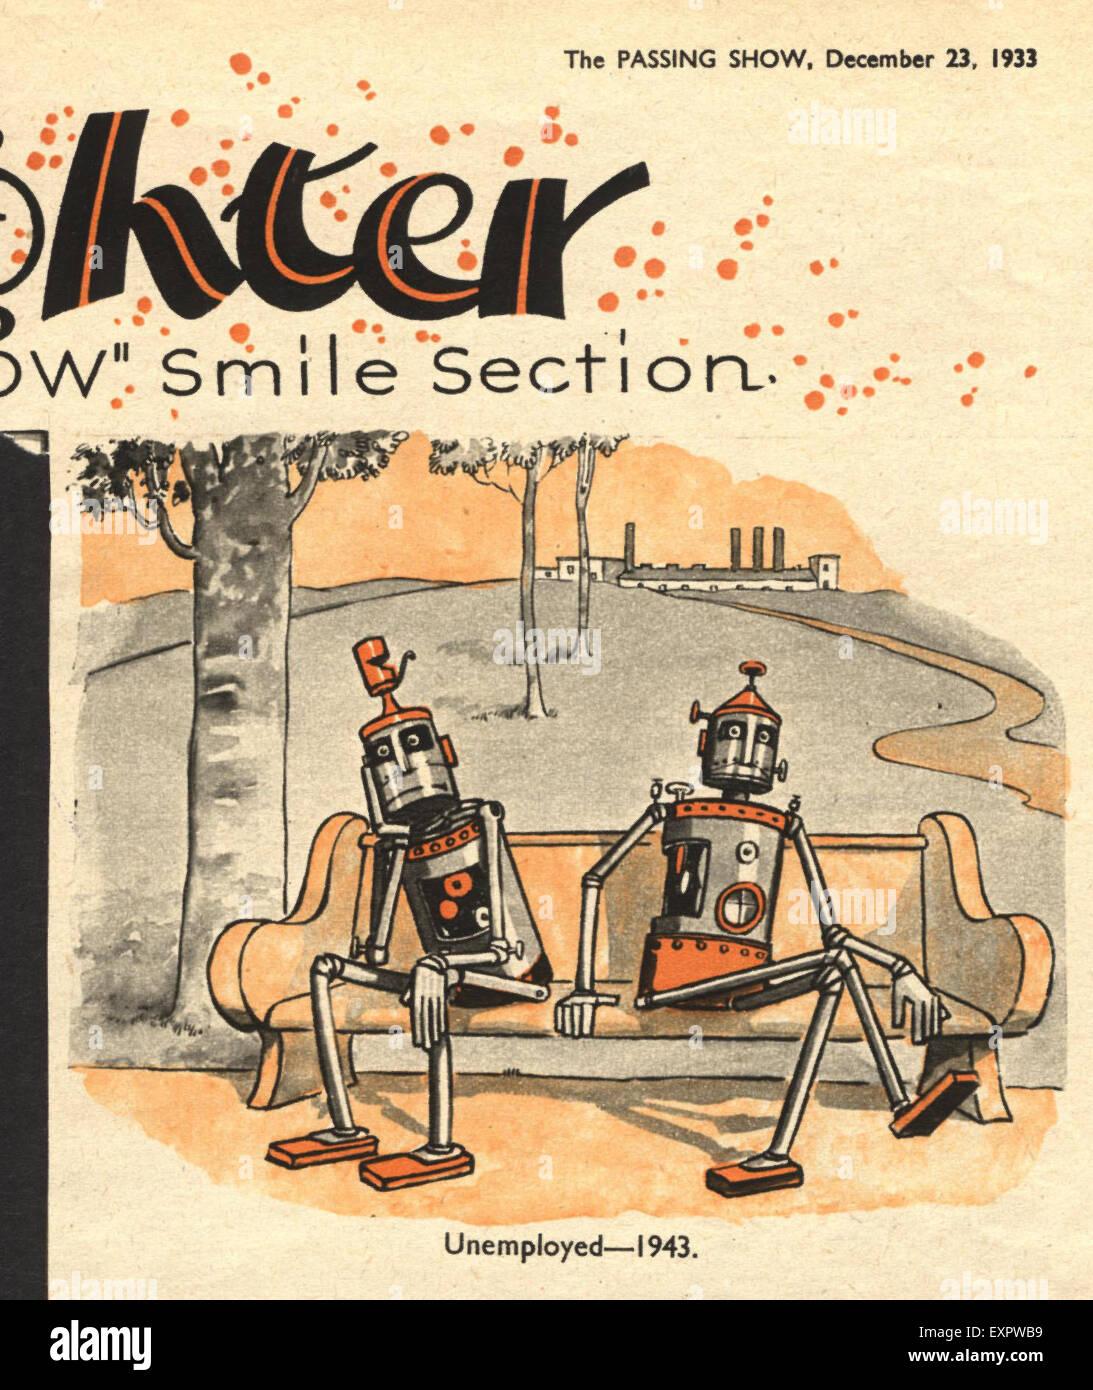 1930S UK Robot Cartoni Animati comico/ piastra Cartoon Immagini Stock